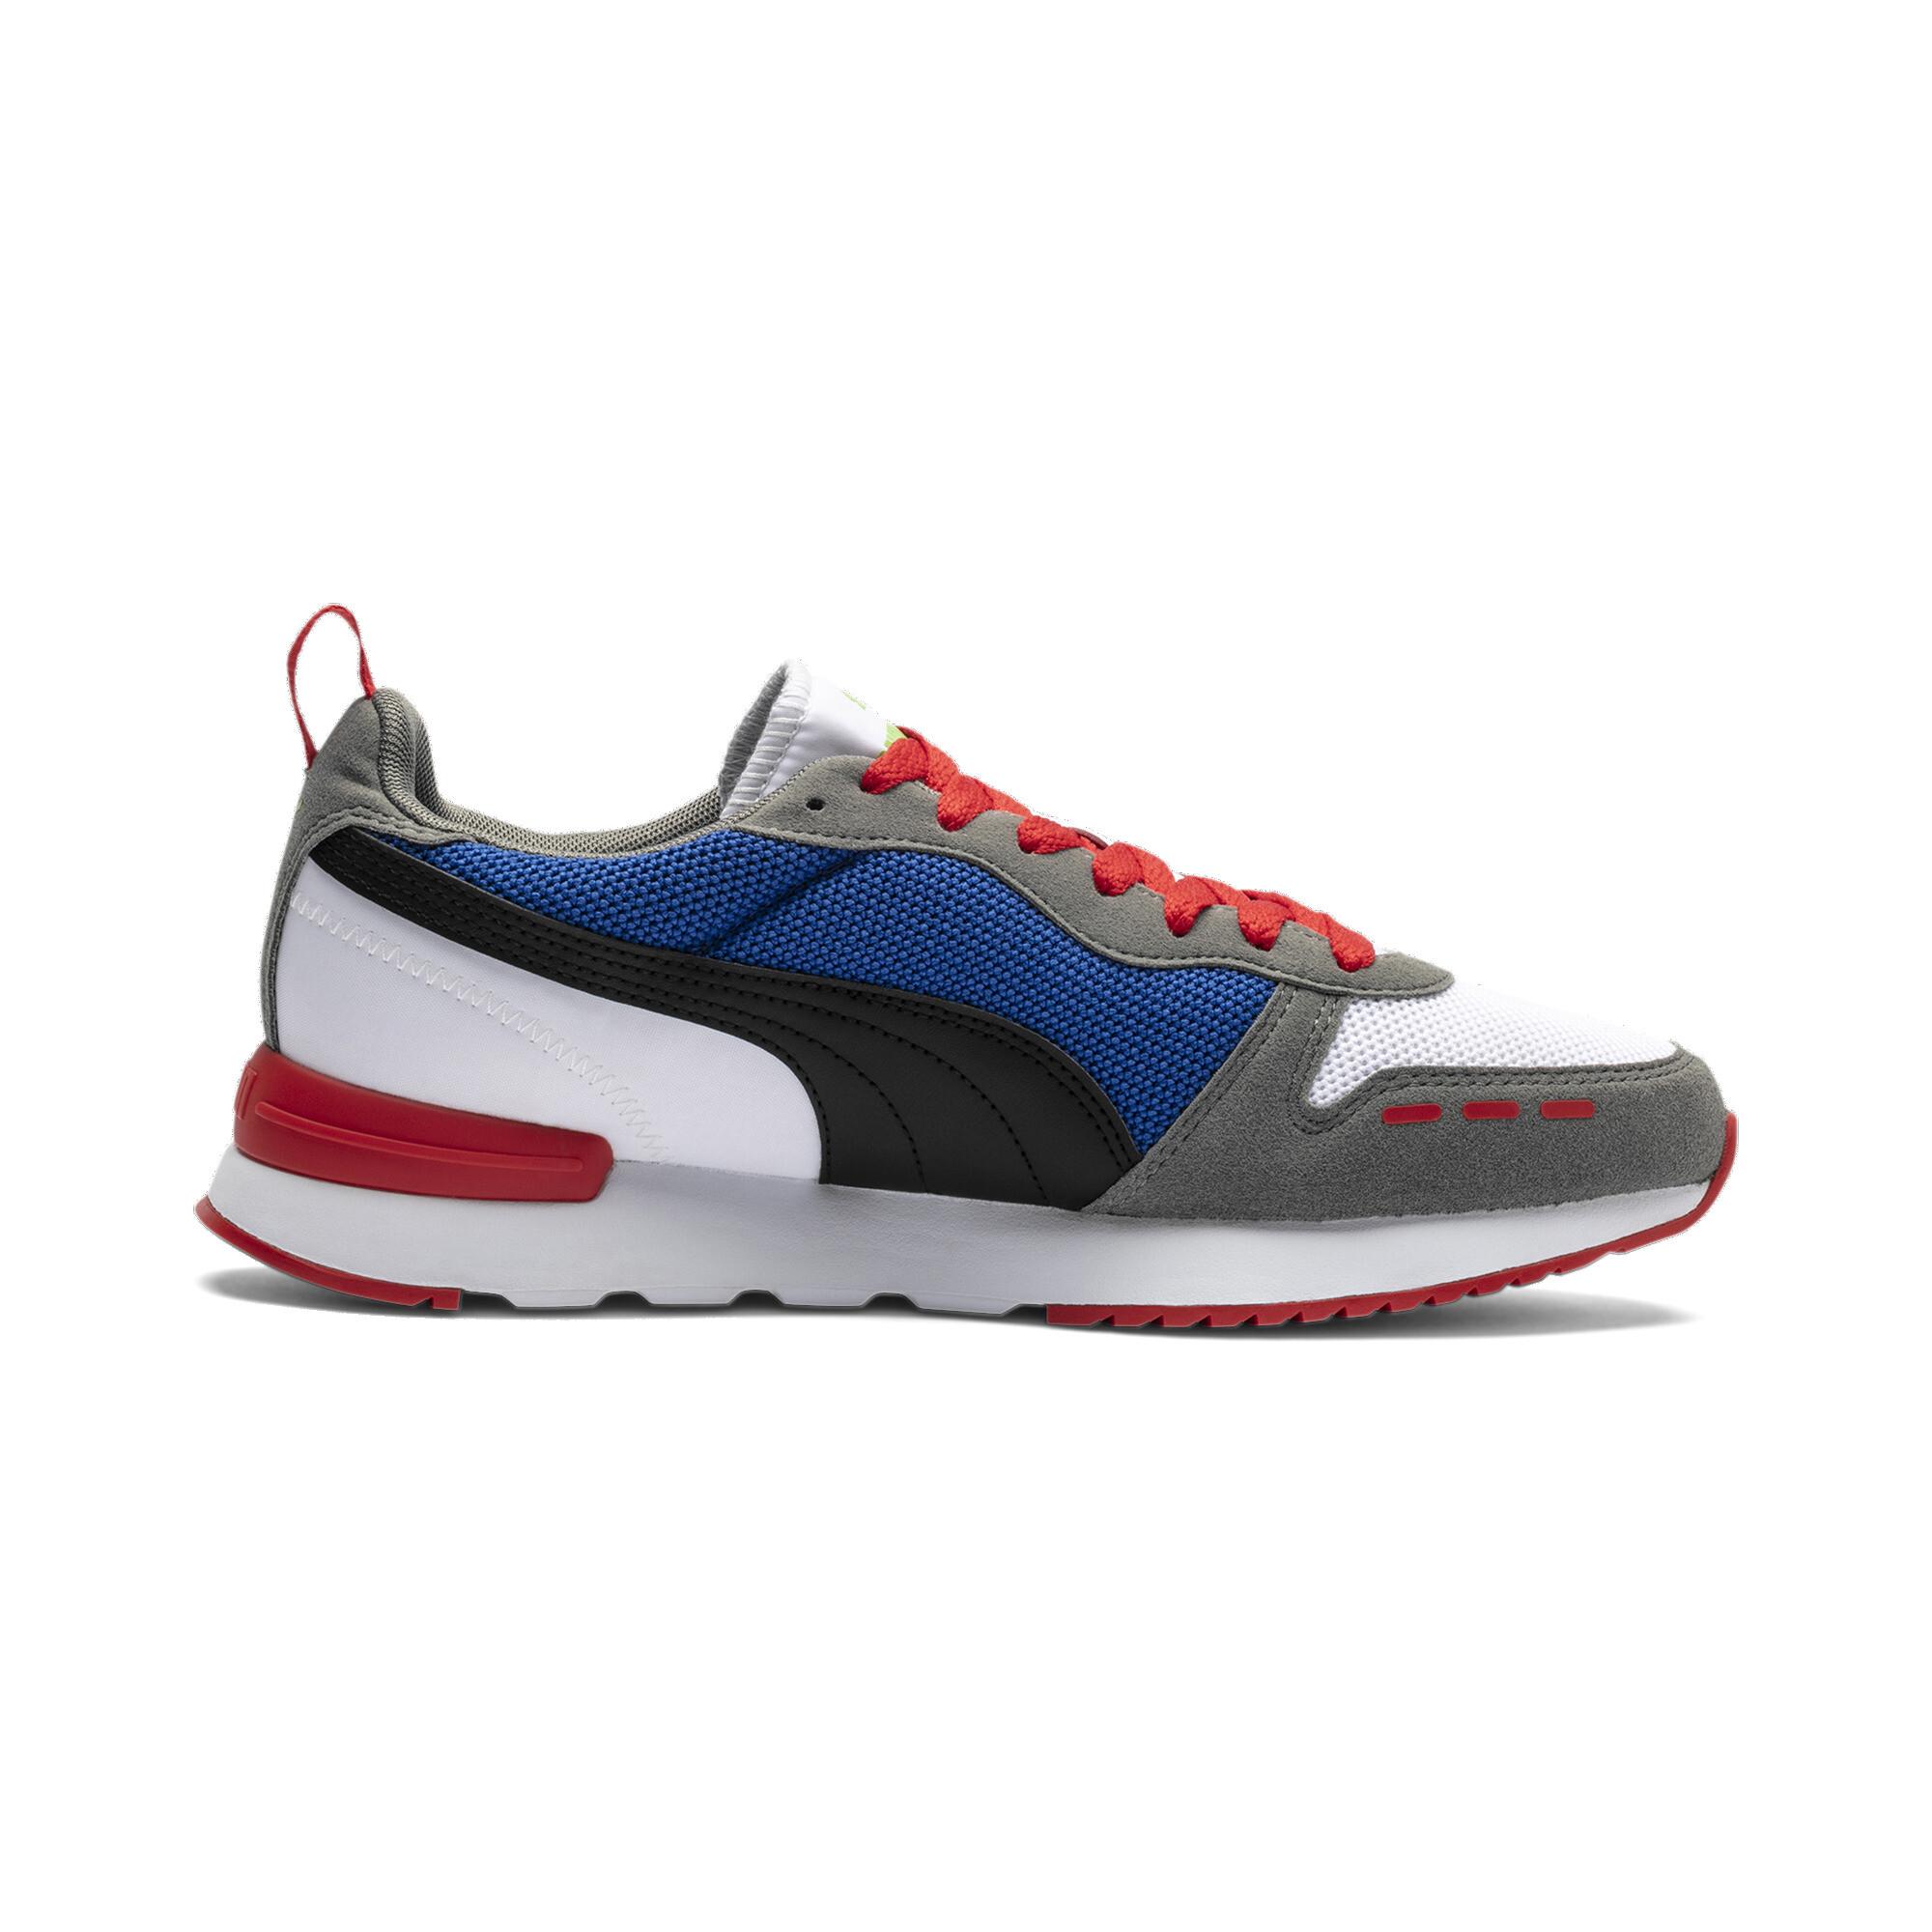 thumbnail 11 - PUMA-Men-039-s-R78-Sneakers